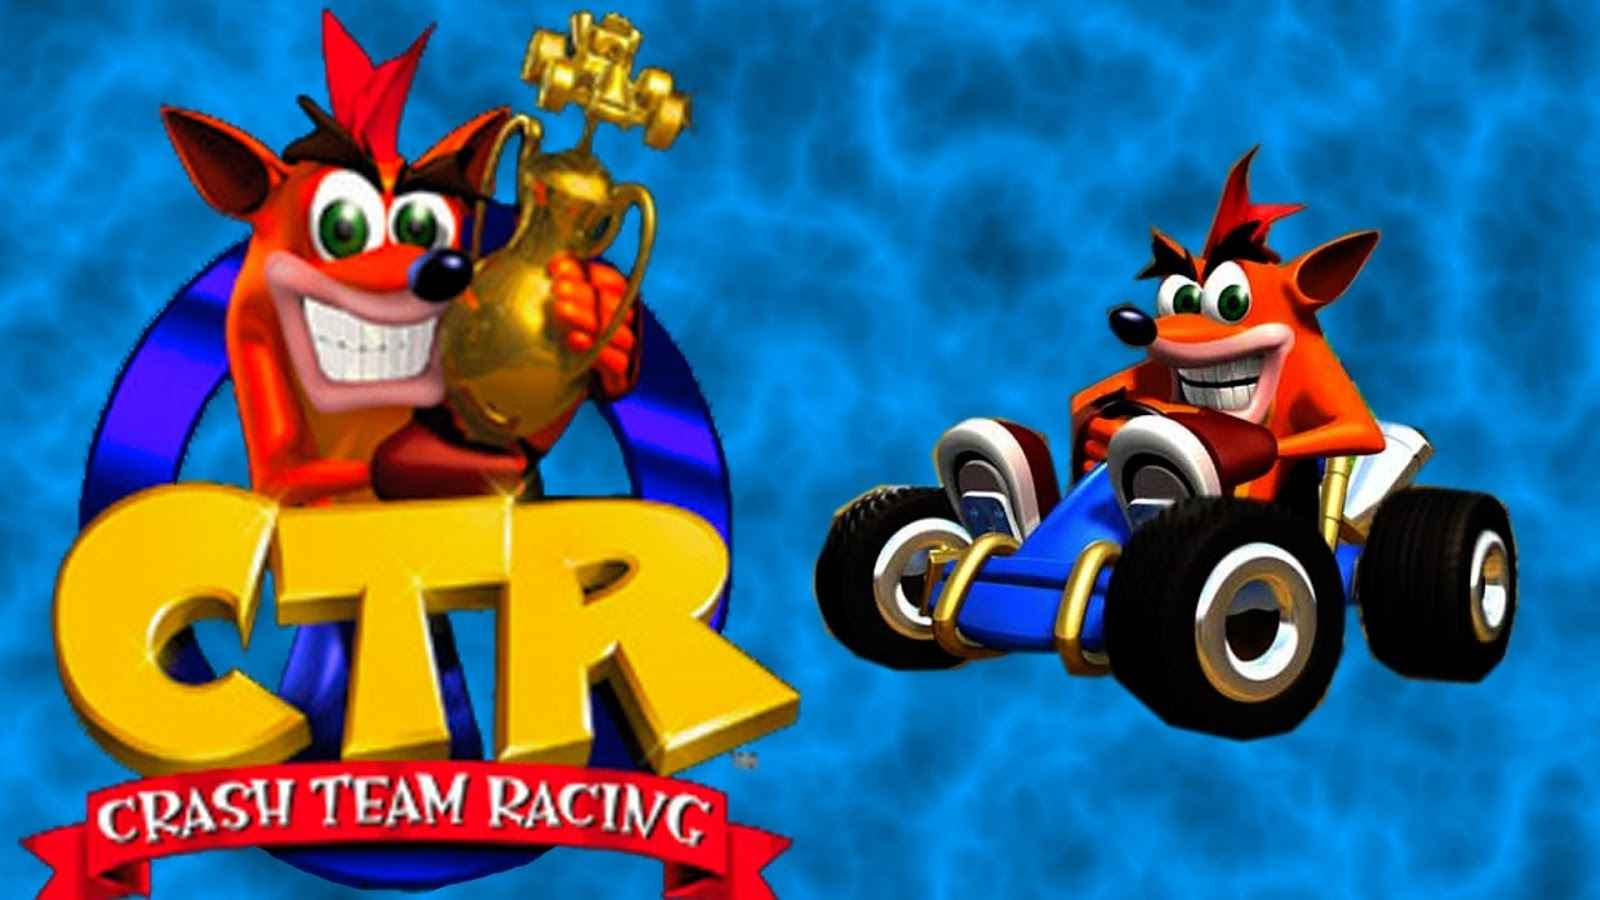 all stars racing 3 a non starter but a crash team racing remaster